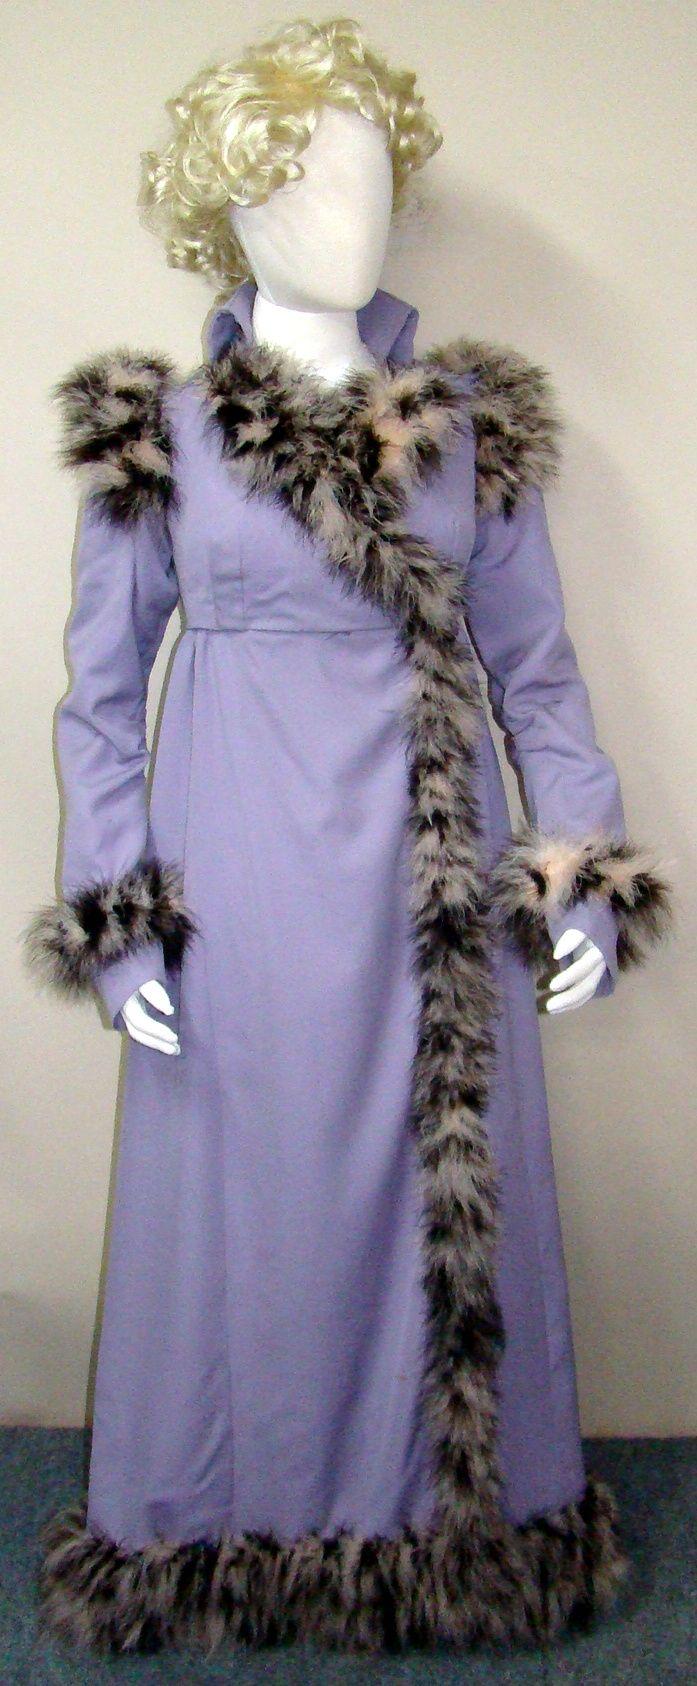 Regency fashion plate the secret dreamworld of a jane austen fan - Redingote Purple Wool With Feather Trim Riding Habitregency Erabetter Lifefashion Platesphoto